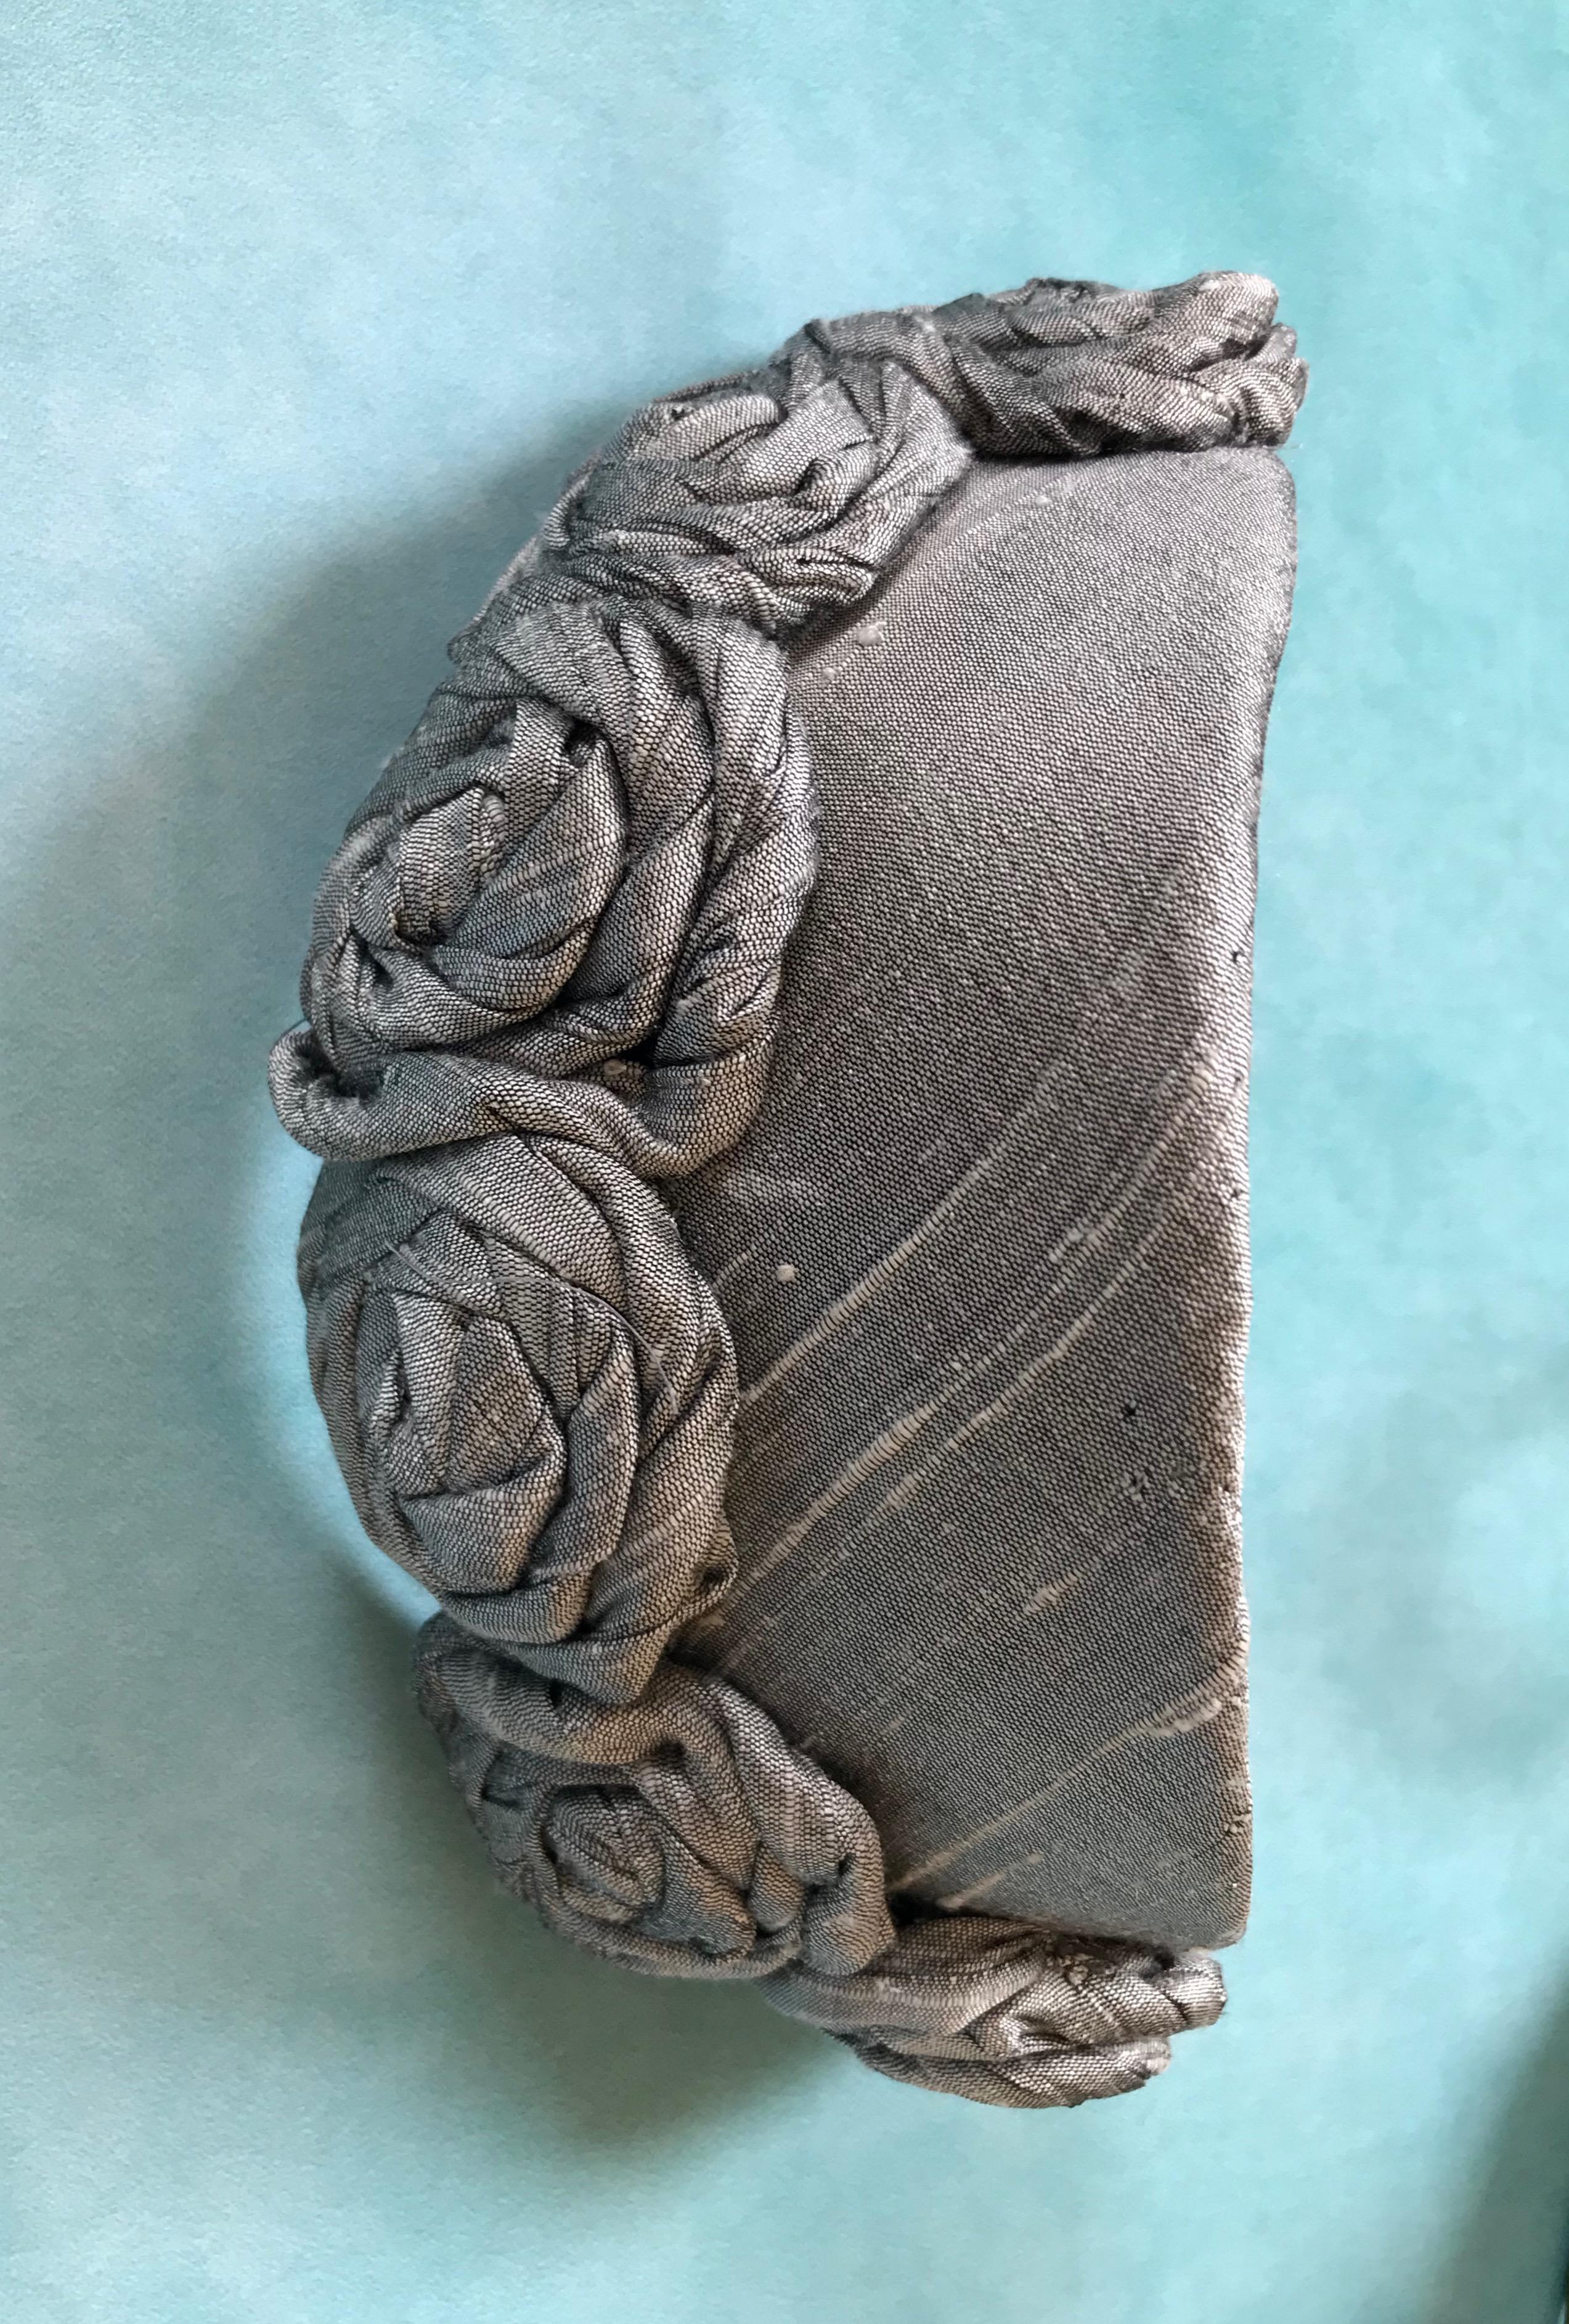 Vintage Style Silver Slub Silk Headpiece by Isabella Josie Millinery